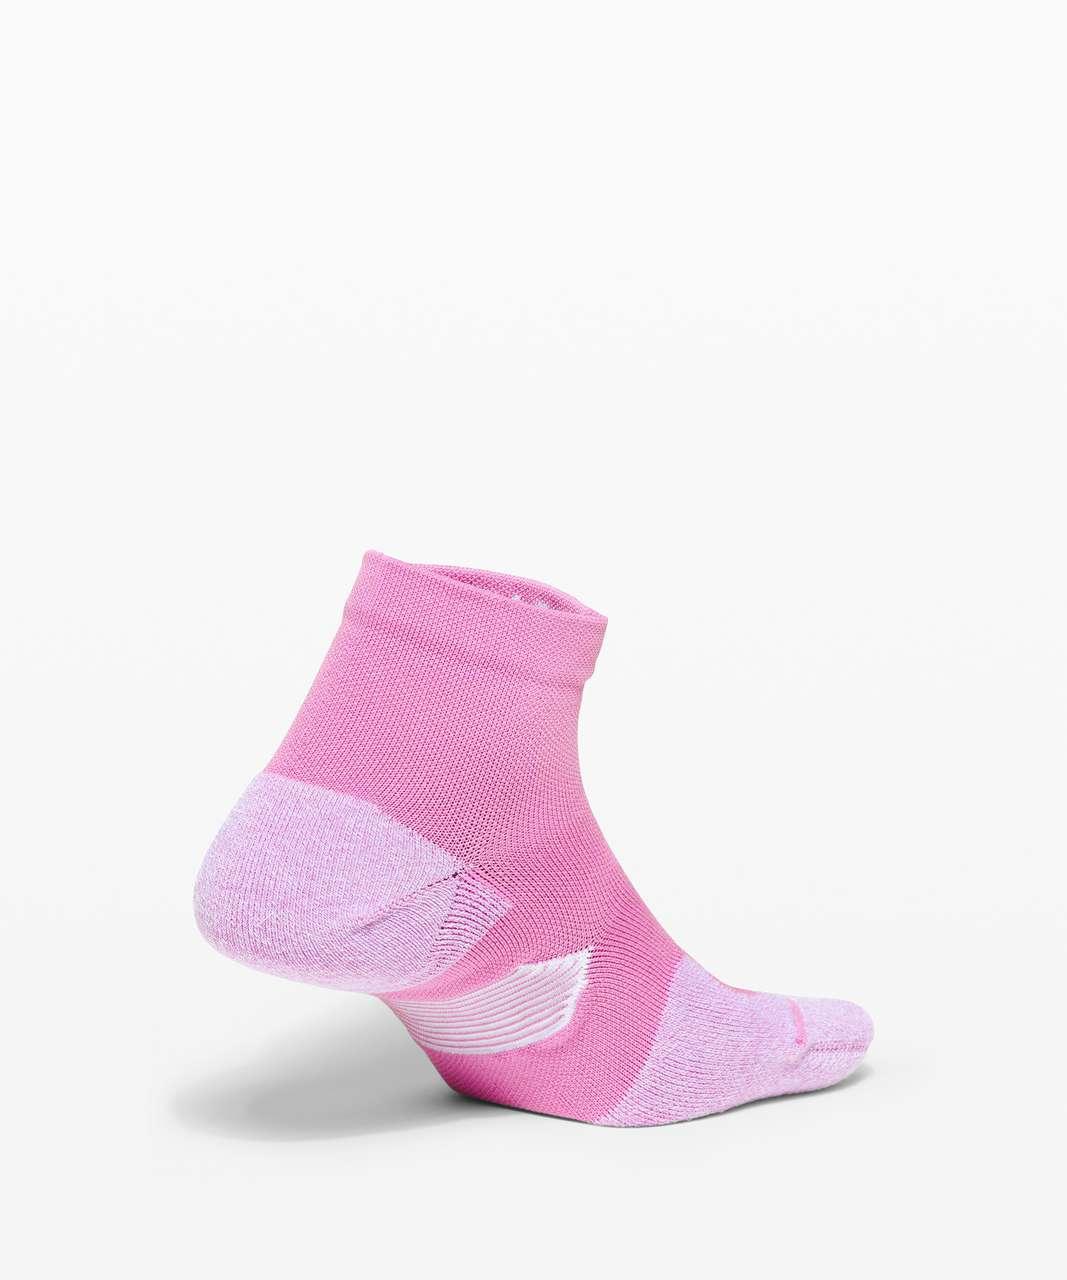 Lululemon Speed Ankle Sock *Silver - Magenta Glow / White